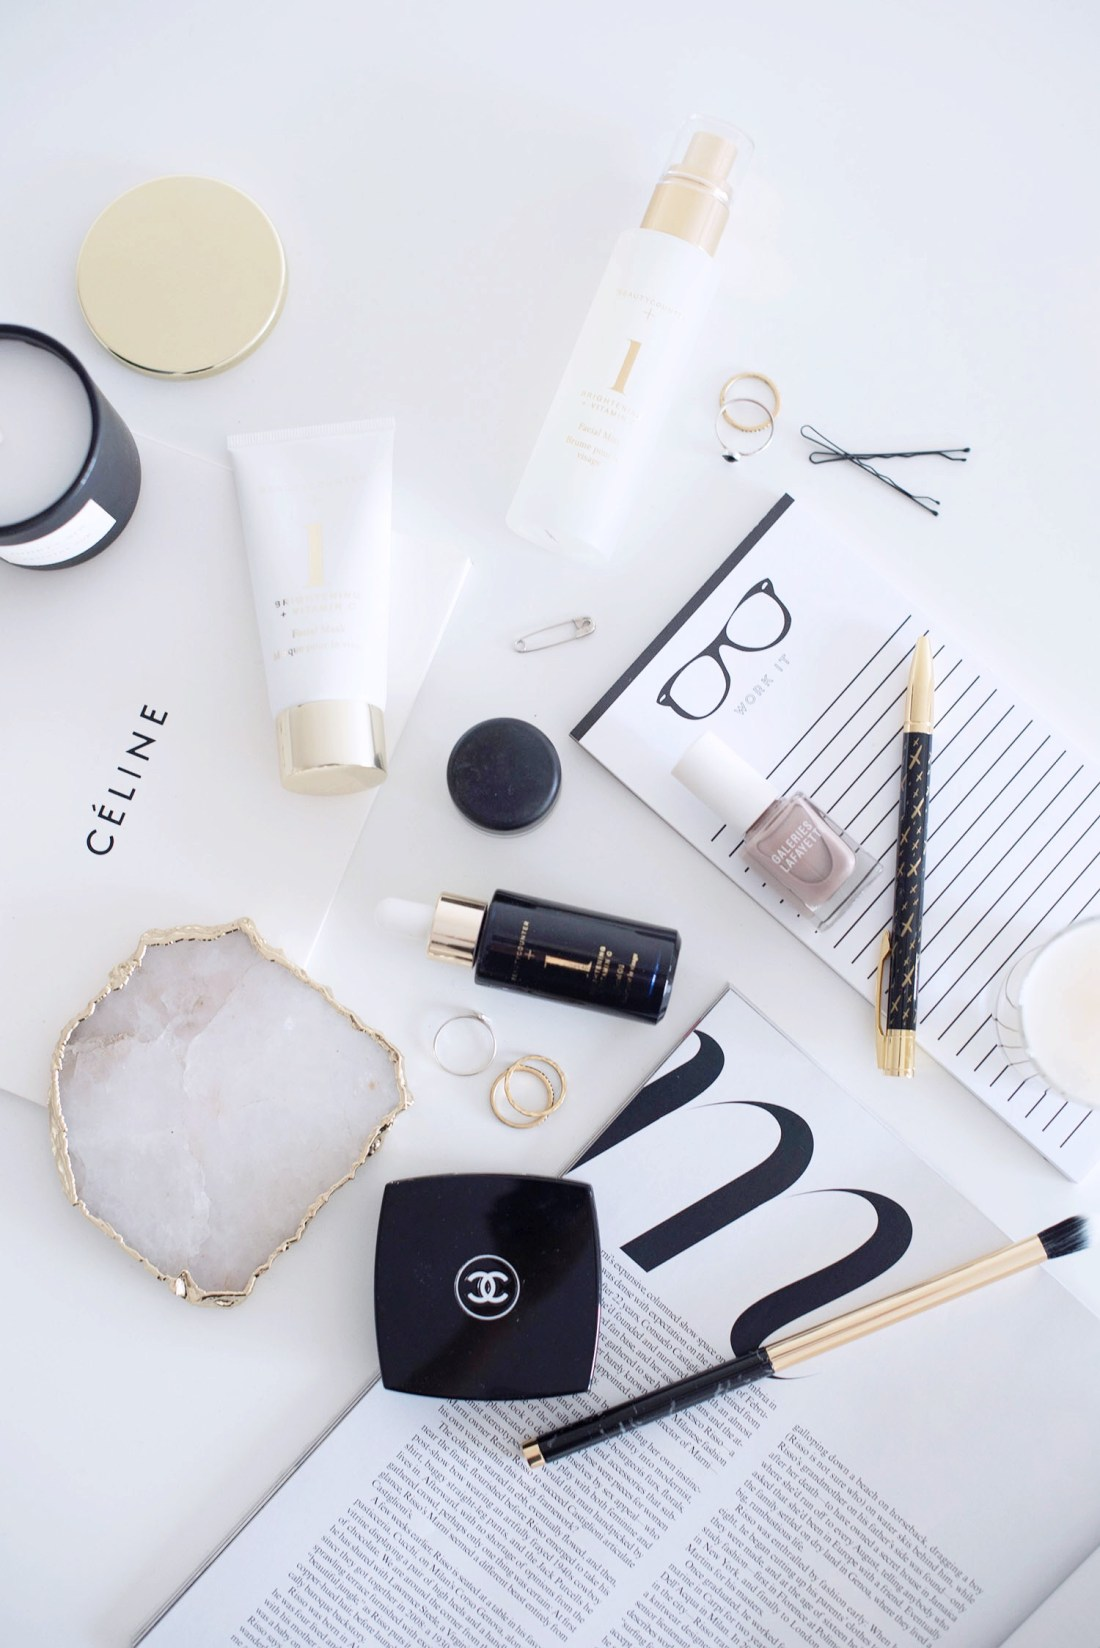 Flatlay featuring Beautycounter face oil, Beautycounter face mask and Chanel blush, captured by Winnipeg beauty blogger Cee Fardoe of Coco & Vera